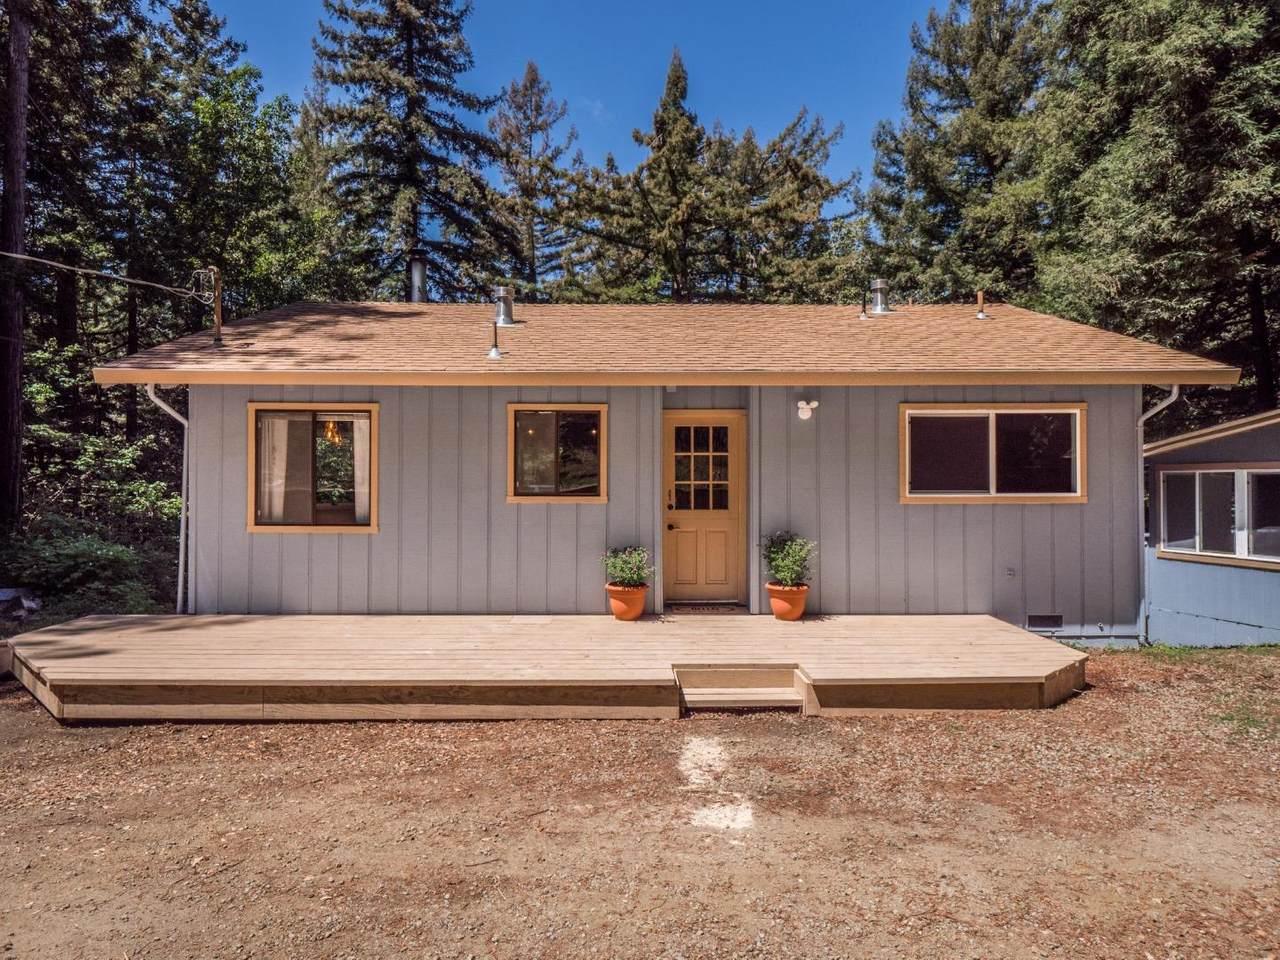 1530 Tindall Ranch Rd - Photo 1